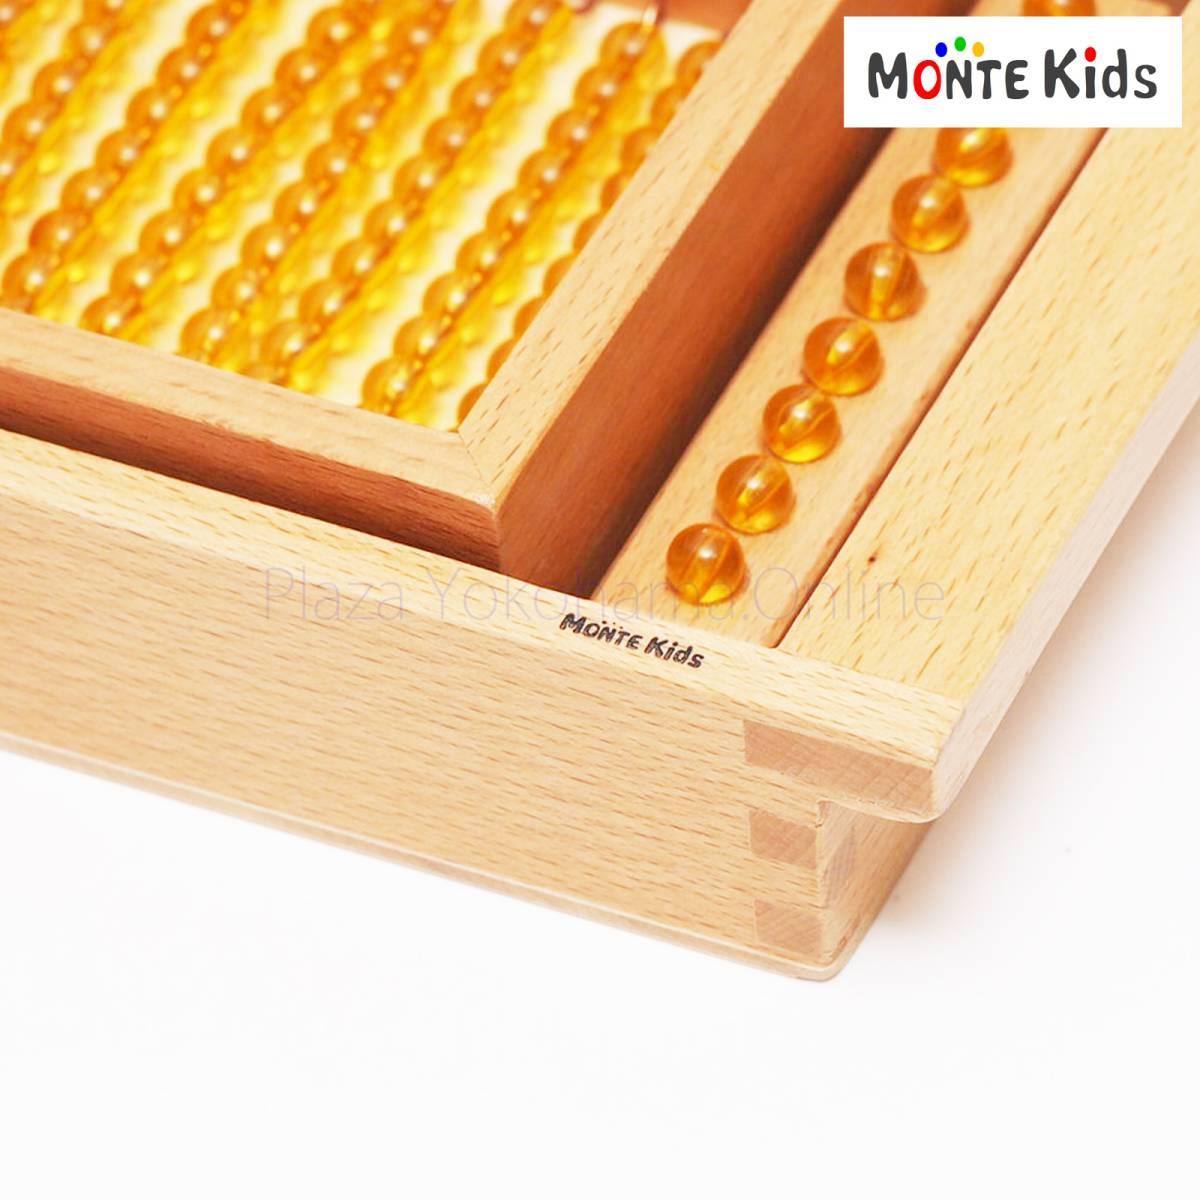 【outlet】☆モンテッソーリ教具☆- 十進法 1-1000の金ビーズ-【MONTE Kids正規品】 純正規格 Montessori 知育玩具教具 早期教育教材_画像3